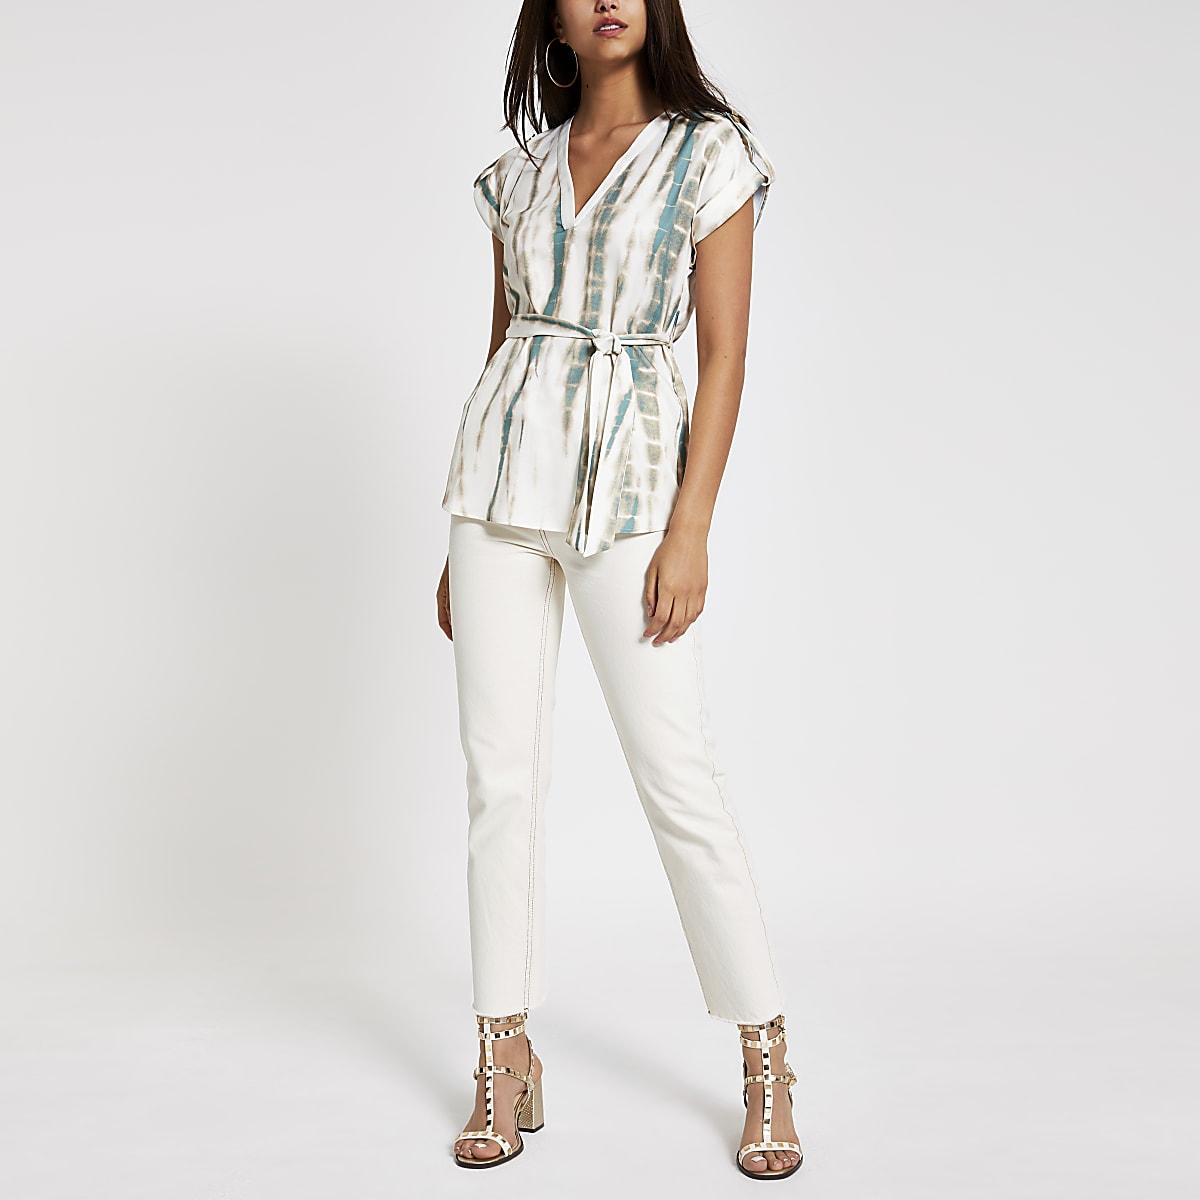 Cream tie dye blouse